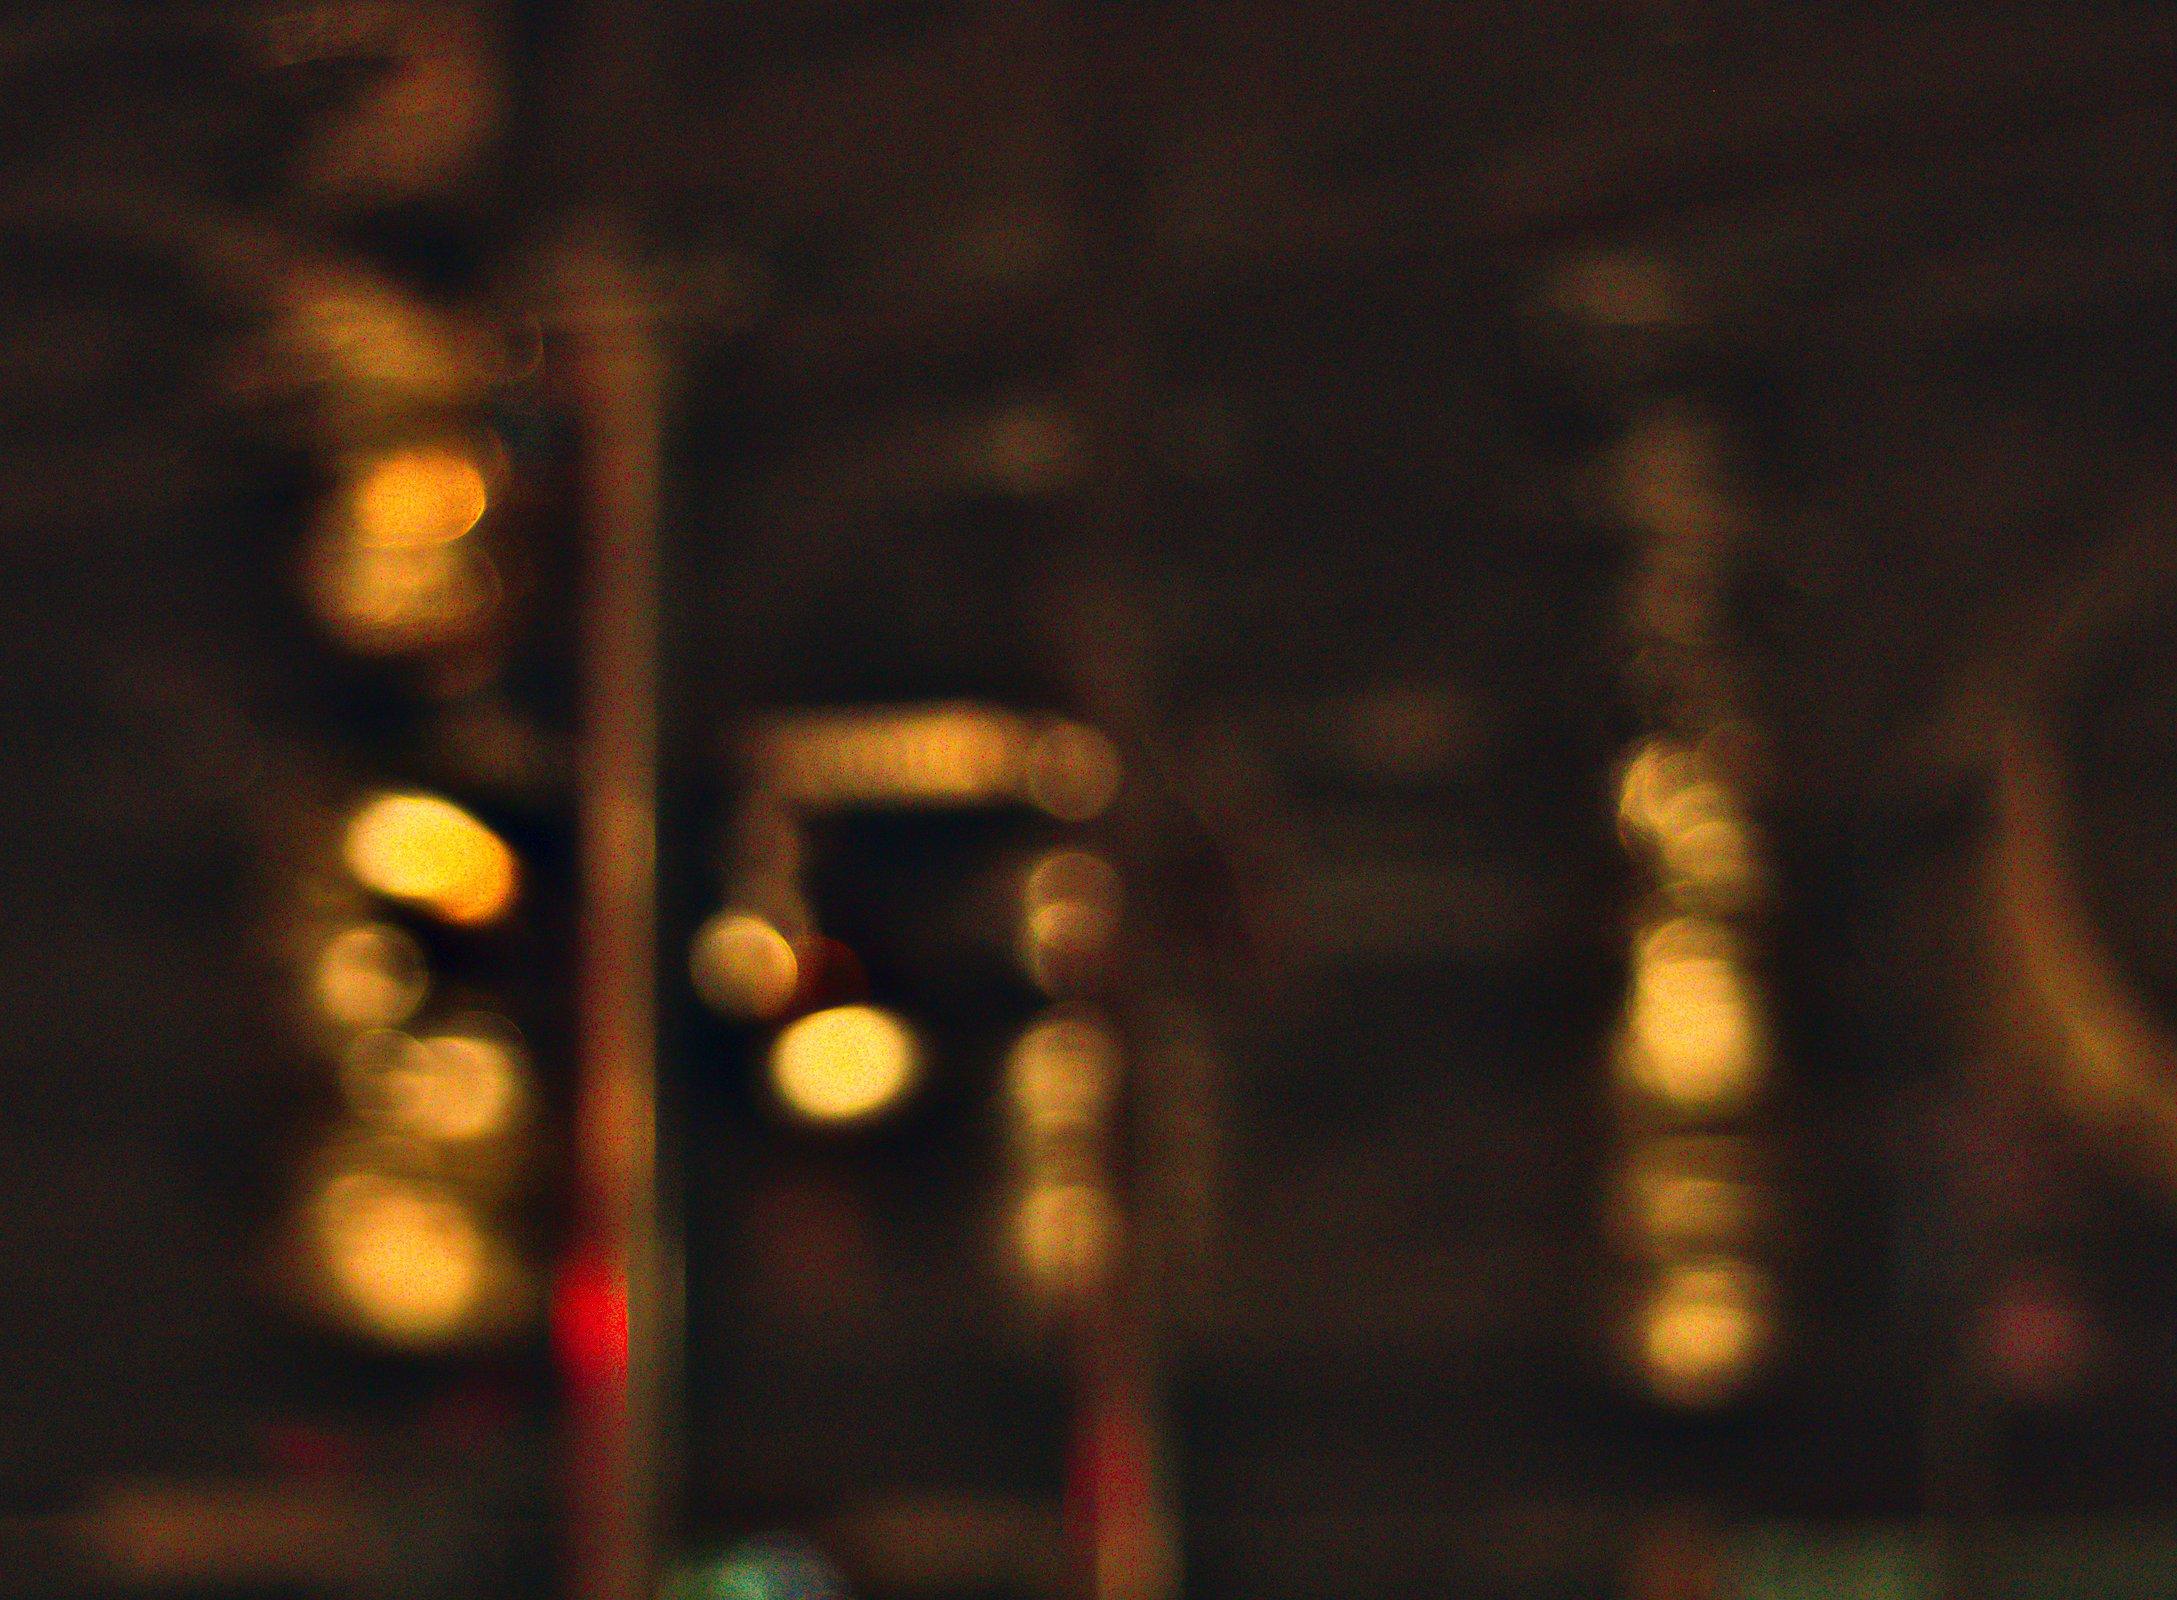 20150521 0419 disco merry go round darktable©JamesECockroft 0012